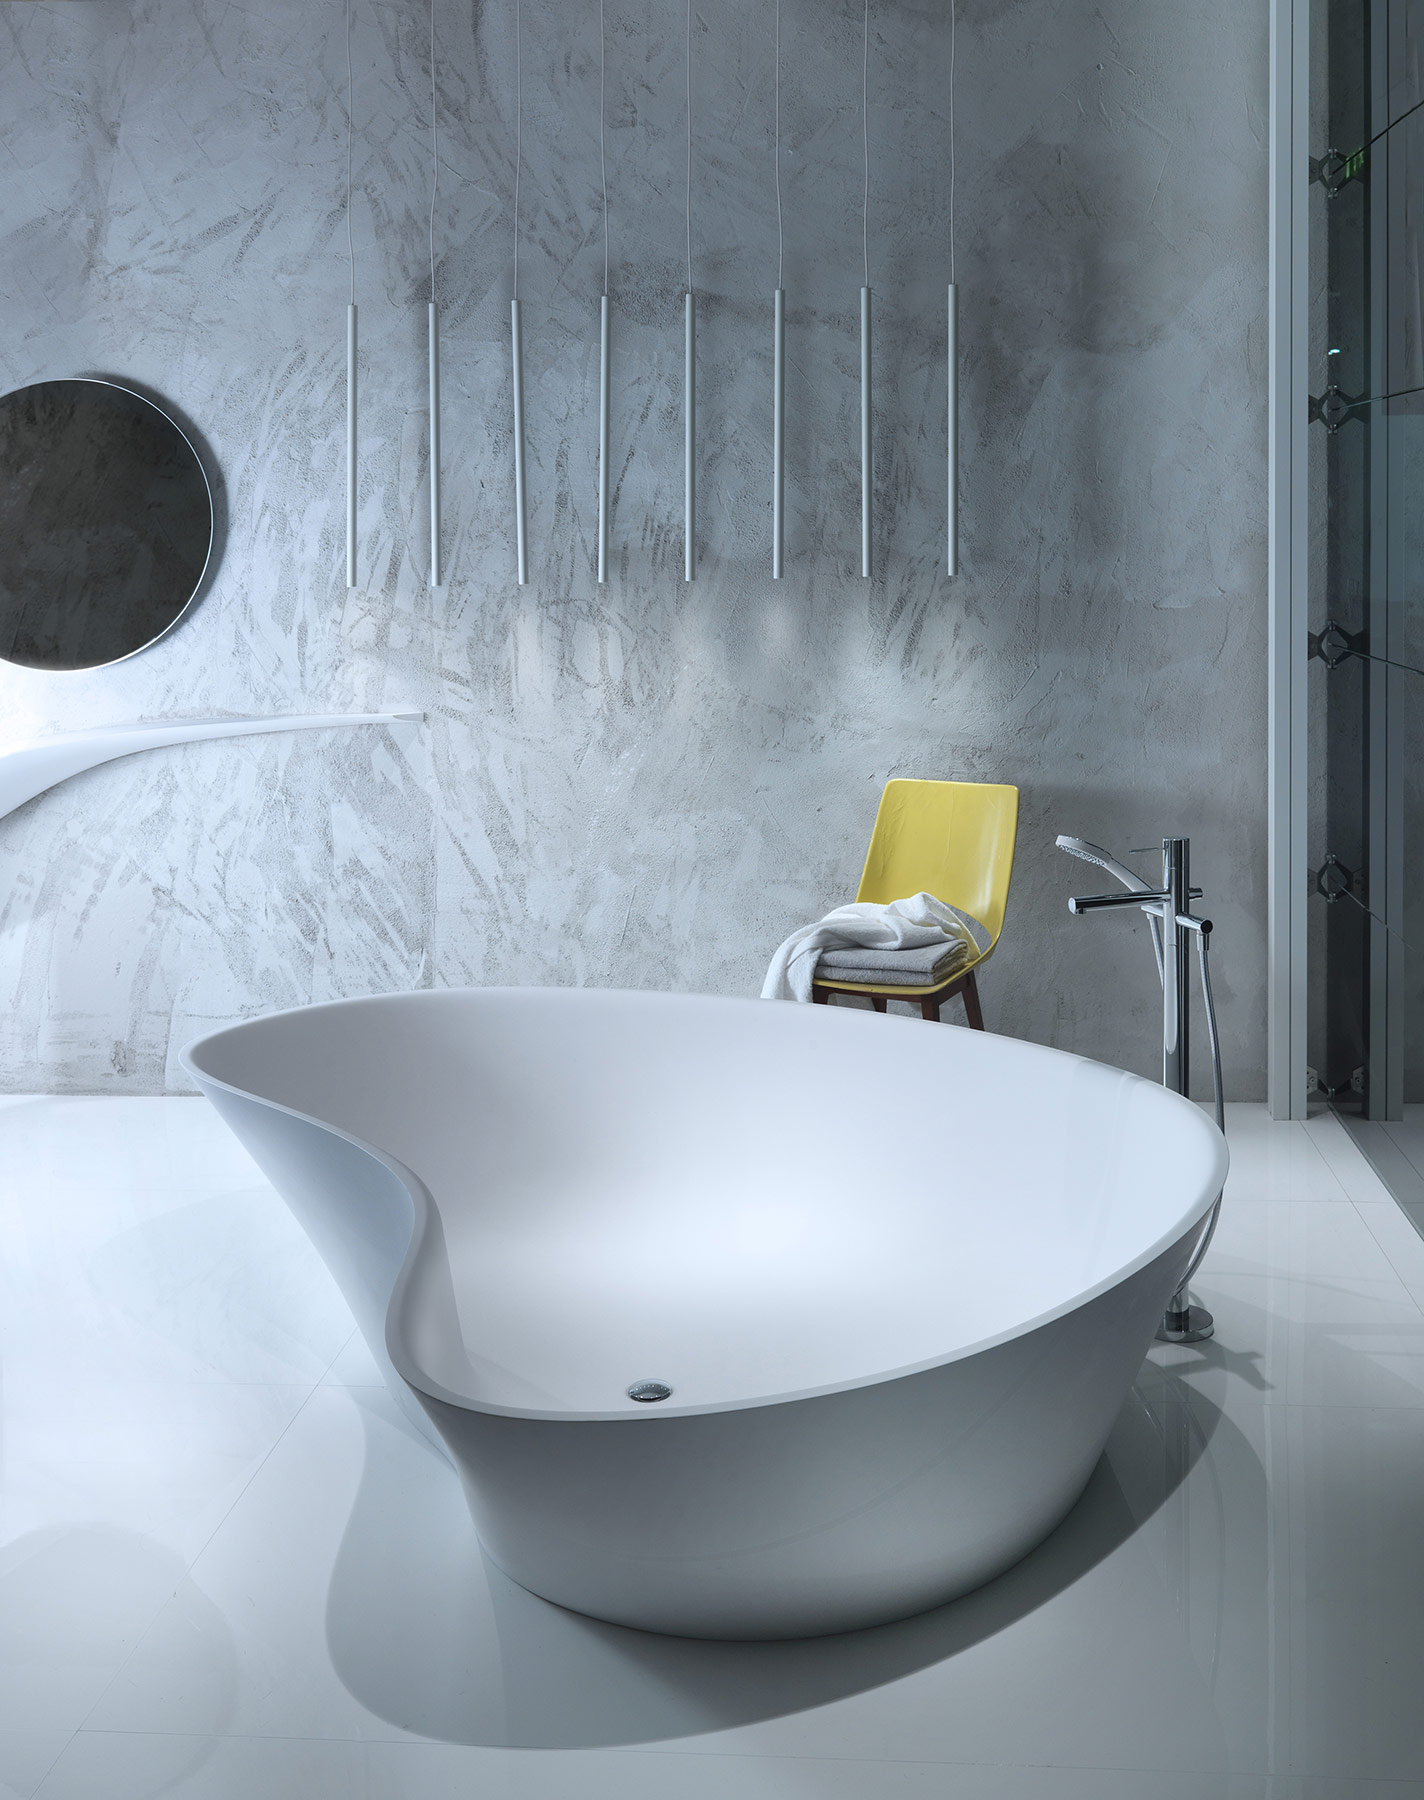 Contemporary Level 45 Freestanding Bathtub